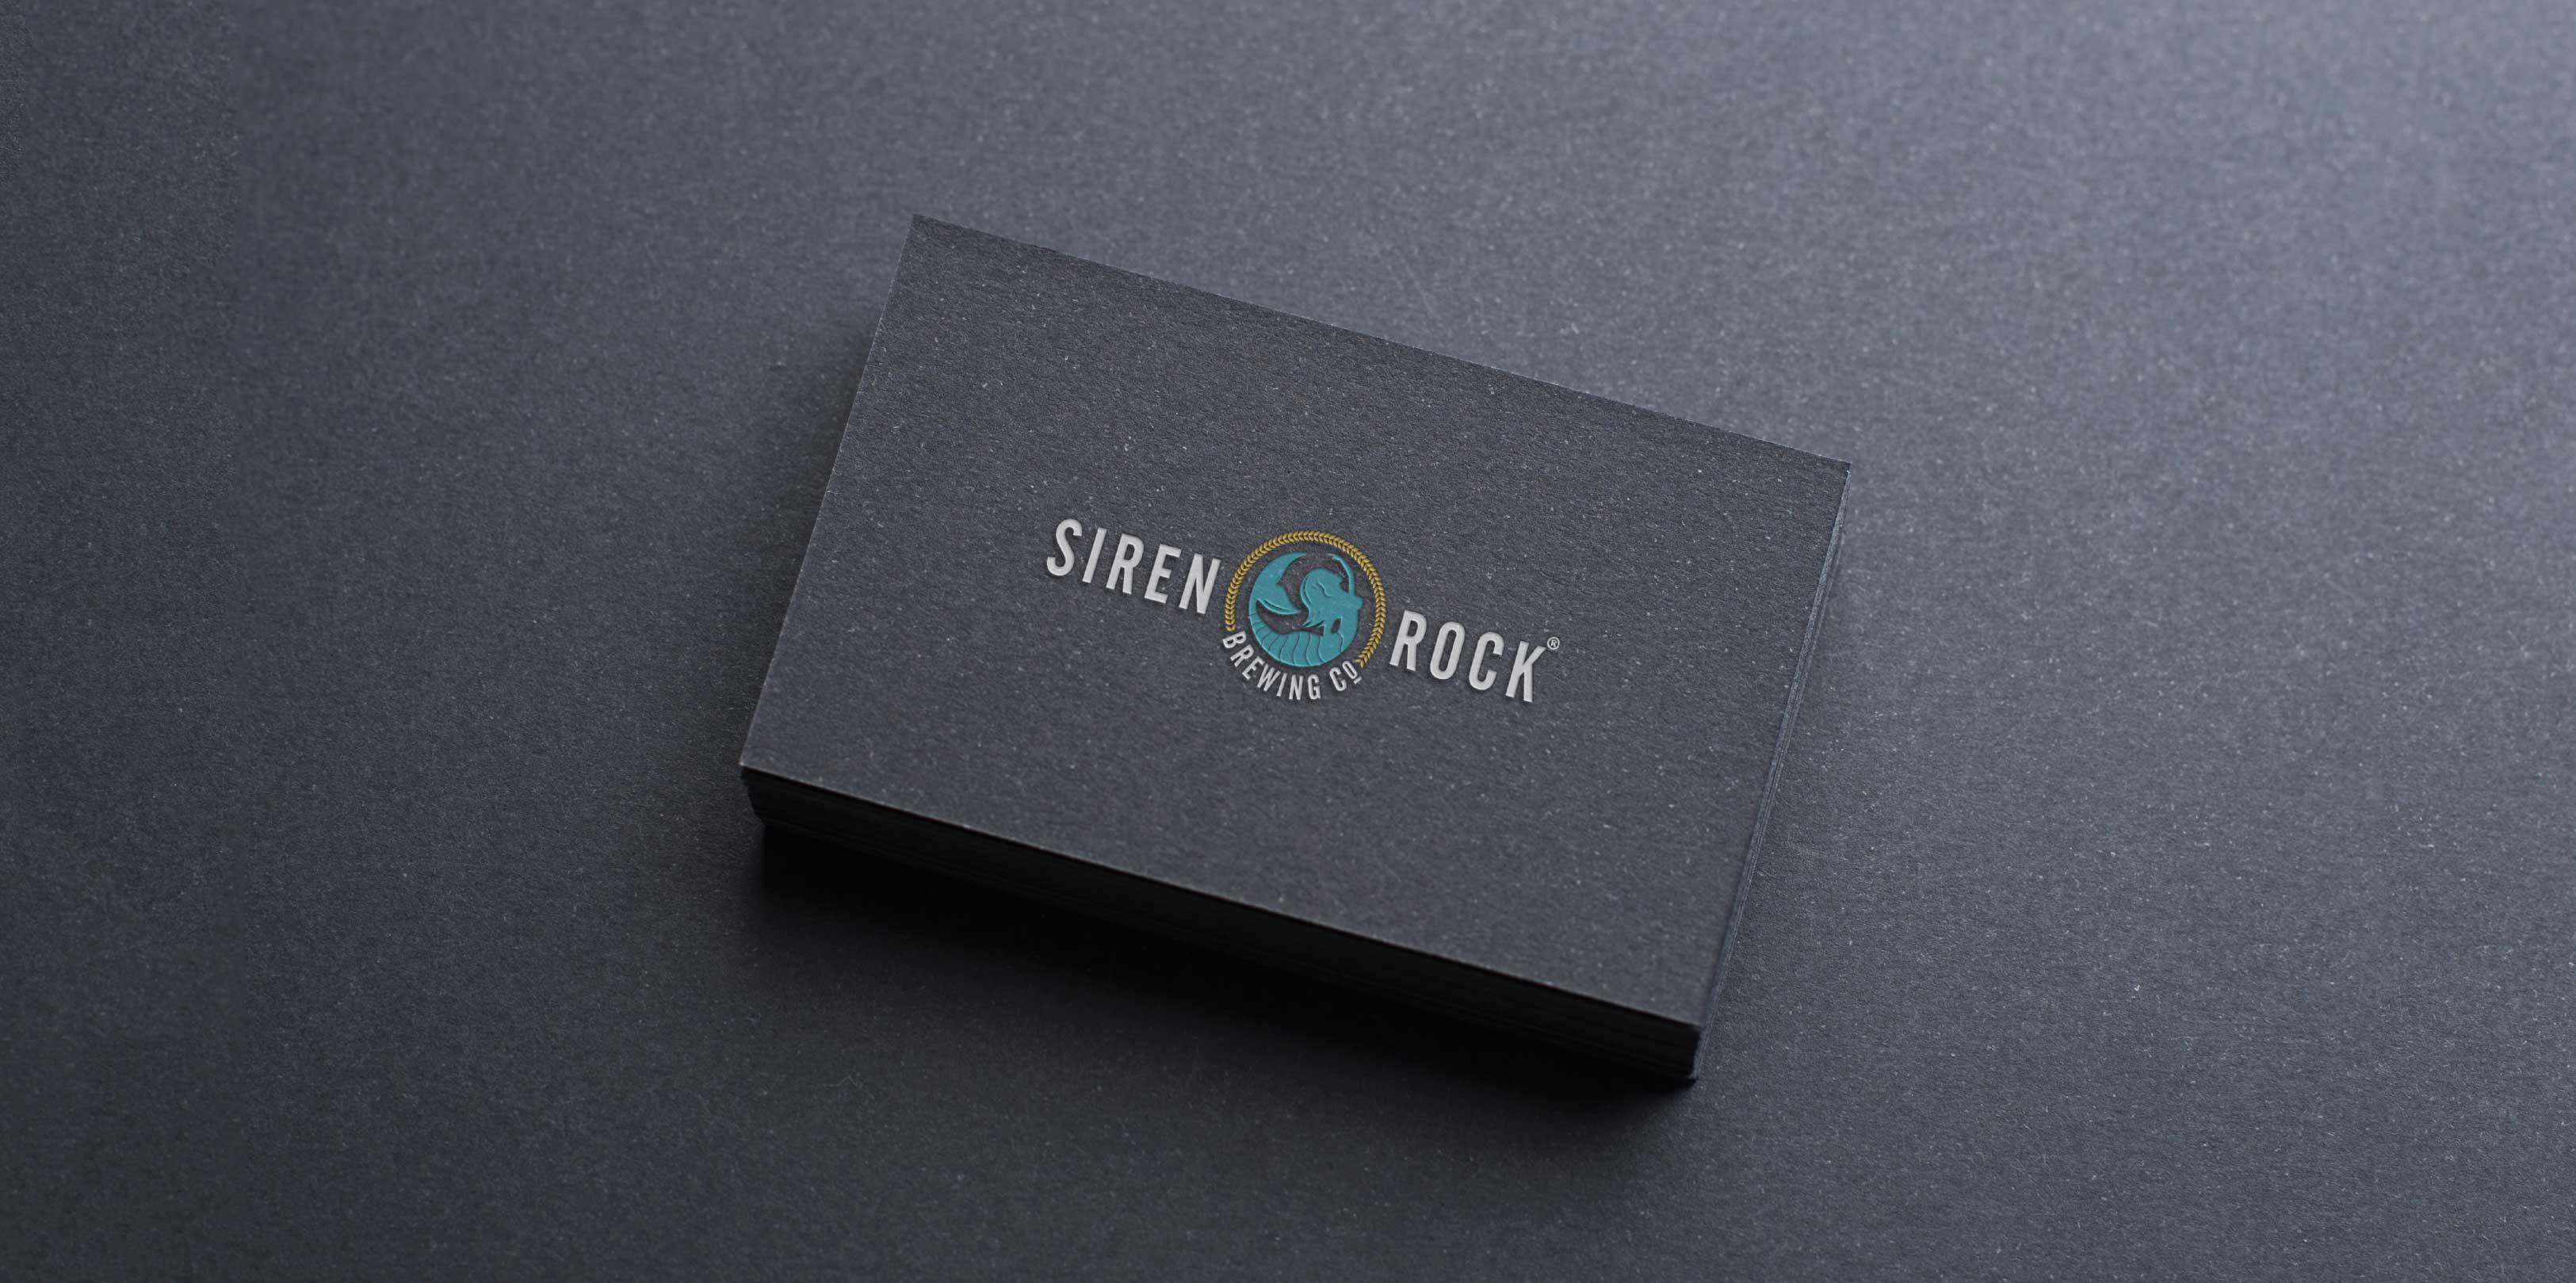 siren Rock Business Cards